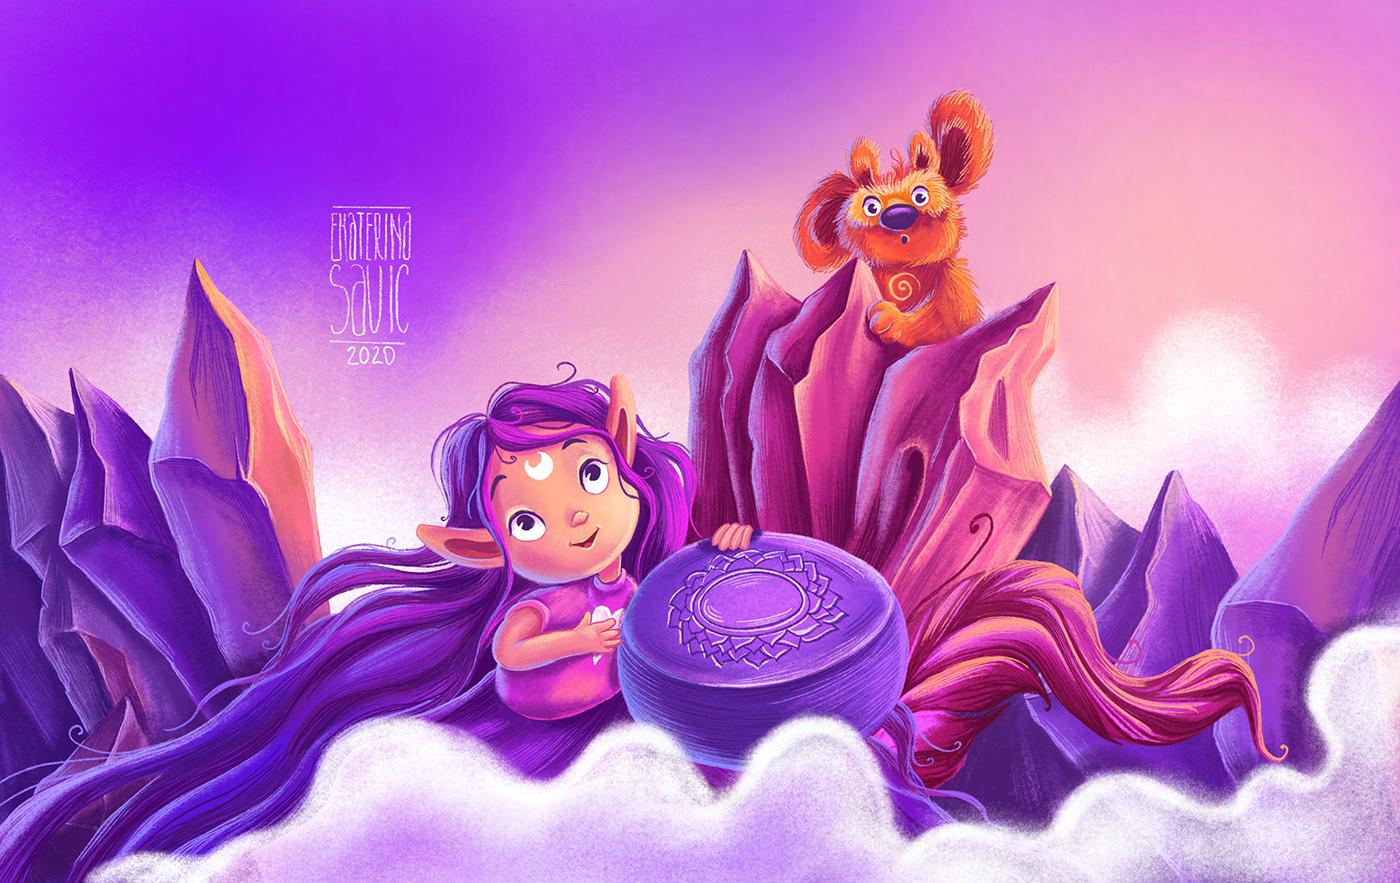 animation  art artwork book cartoon Character children cute design environment fairy tale game ILLUSTRATION  Love mermaid Nature rainbow